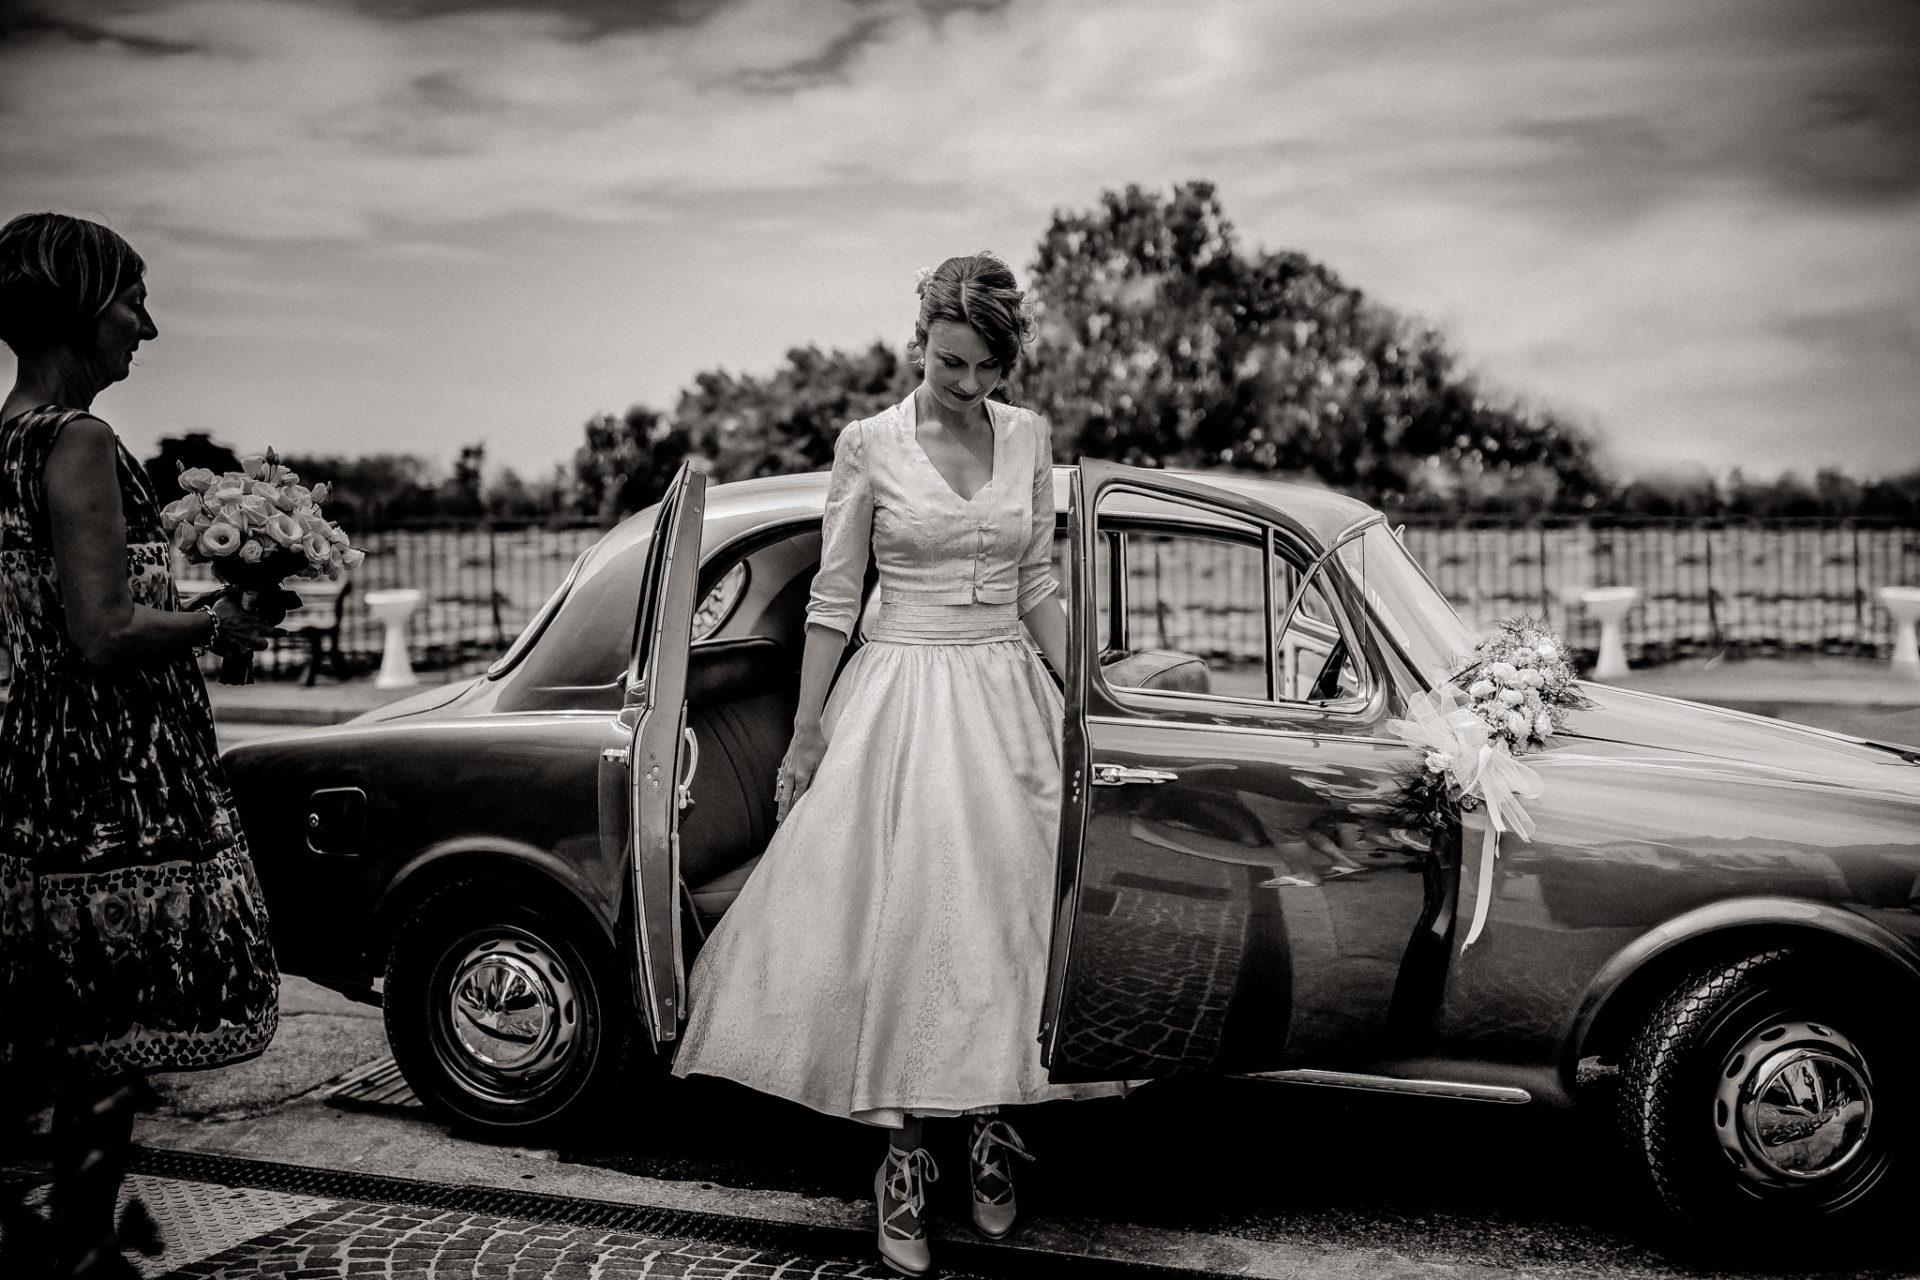 wedding photographer amalfi coast-italy wedding Paestum ceremony-bride arriving by car